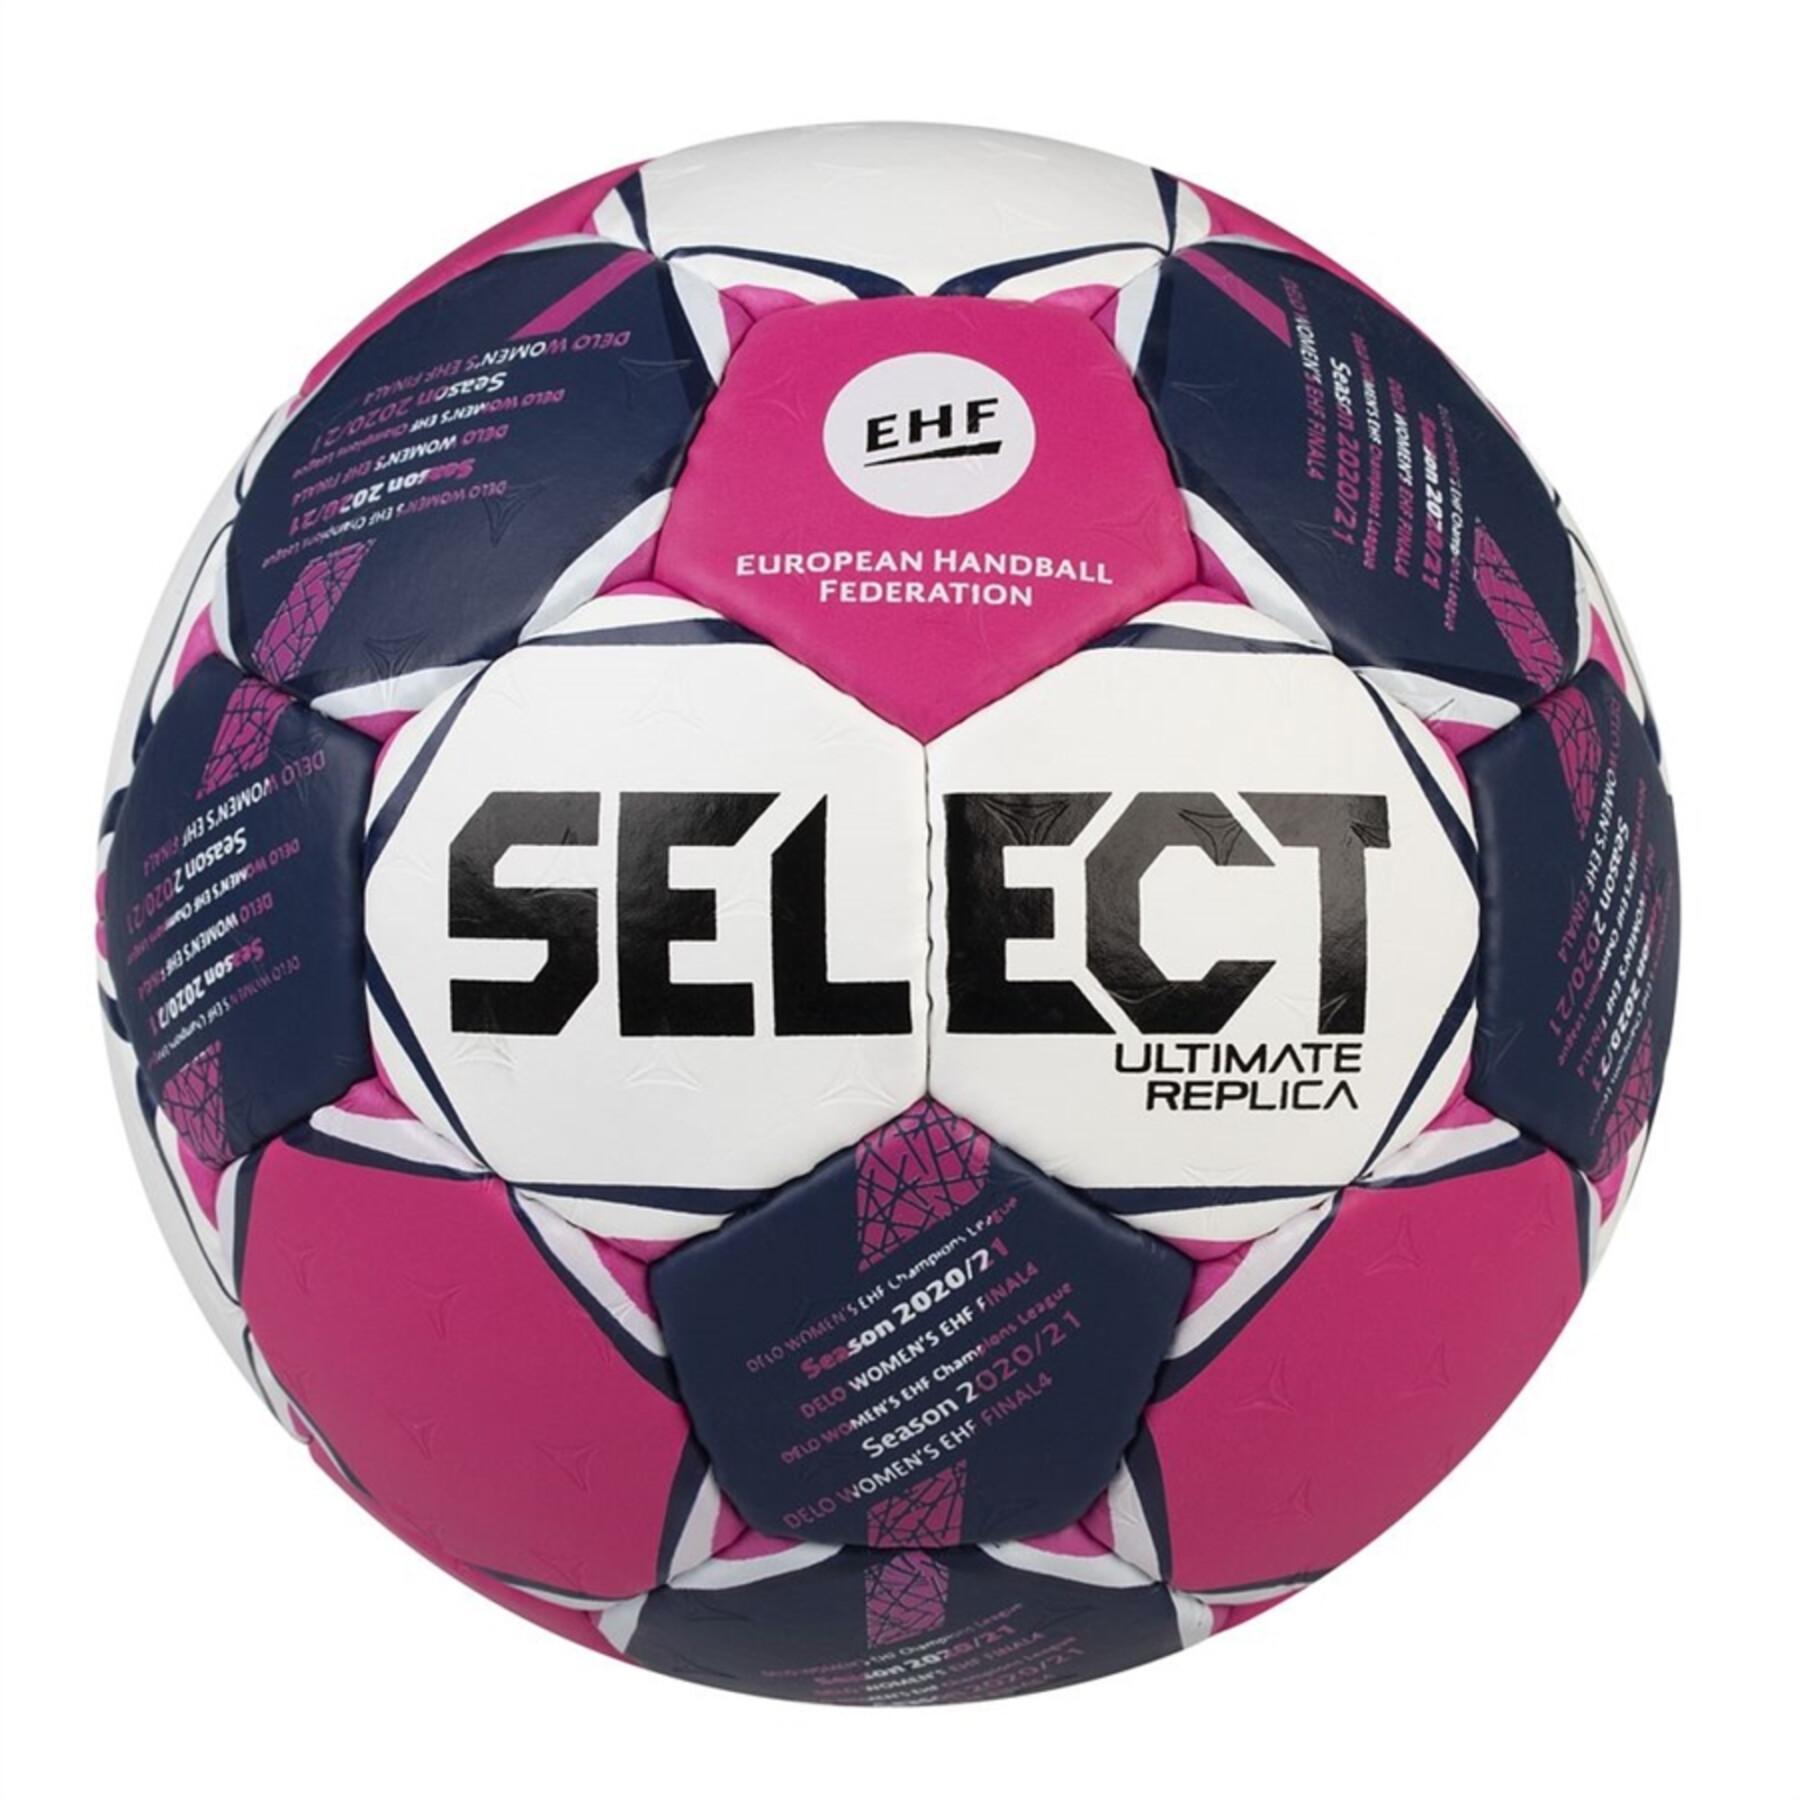 Ballon femme Ultimate Replica Champions League 2020/21